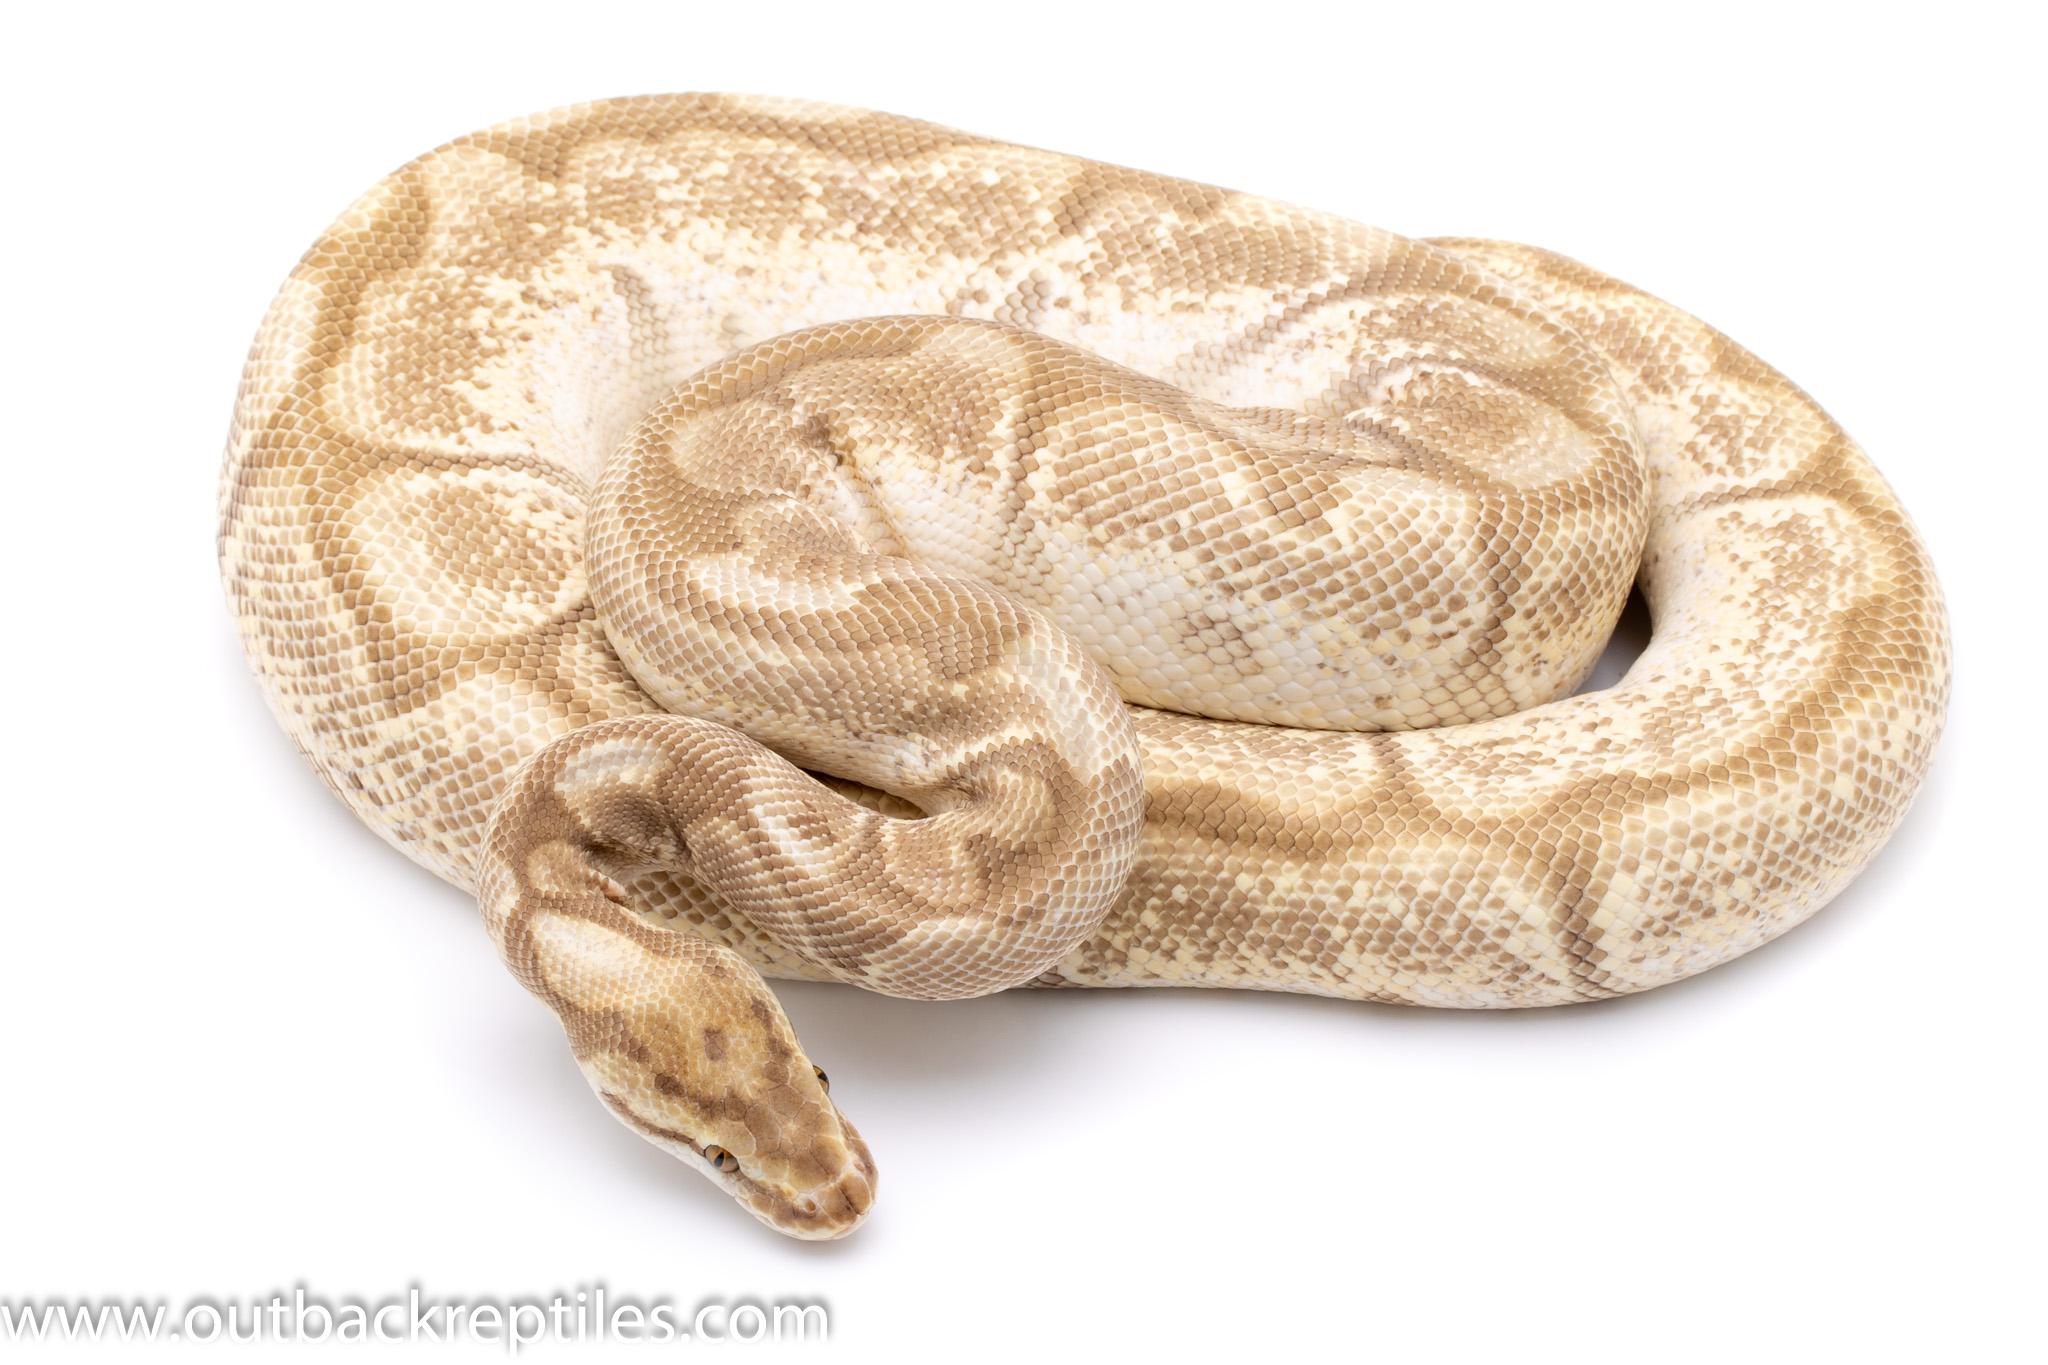 cinnamon lesser spider adult breeder ball python for sale